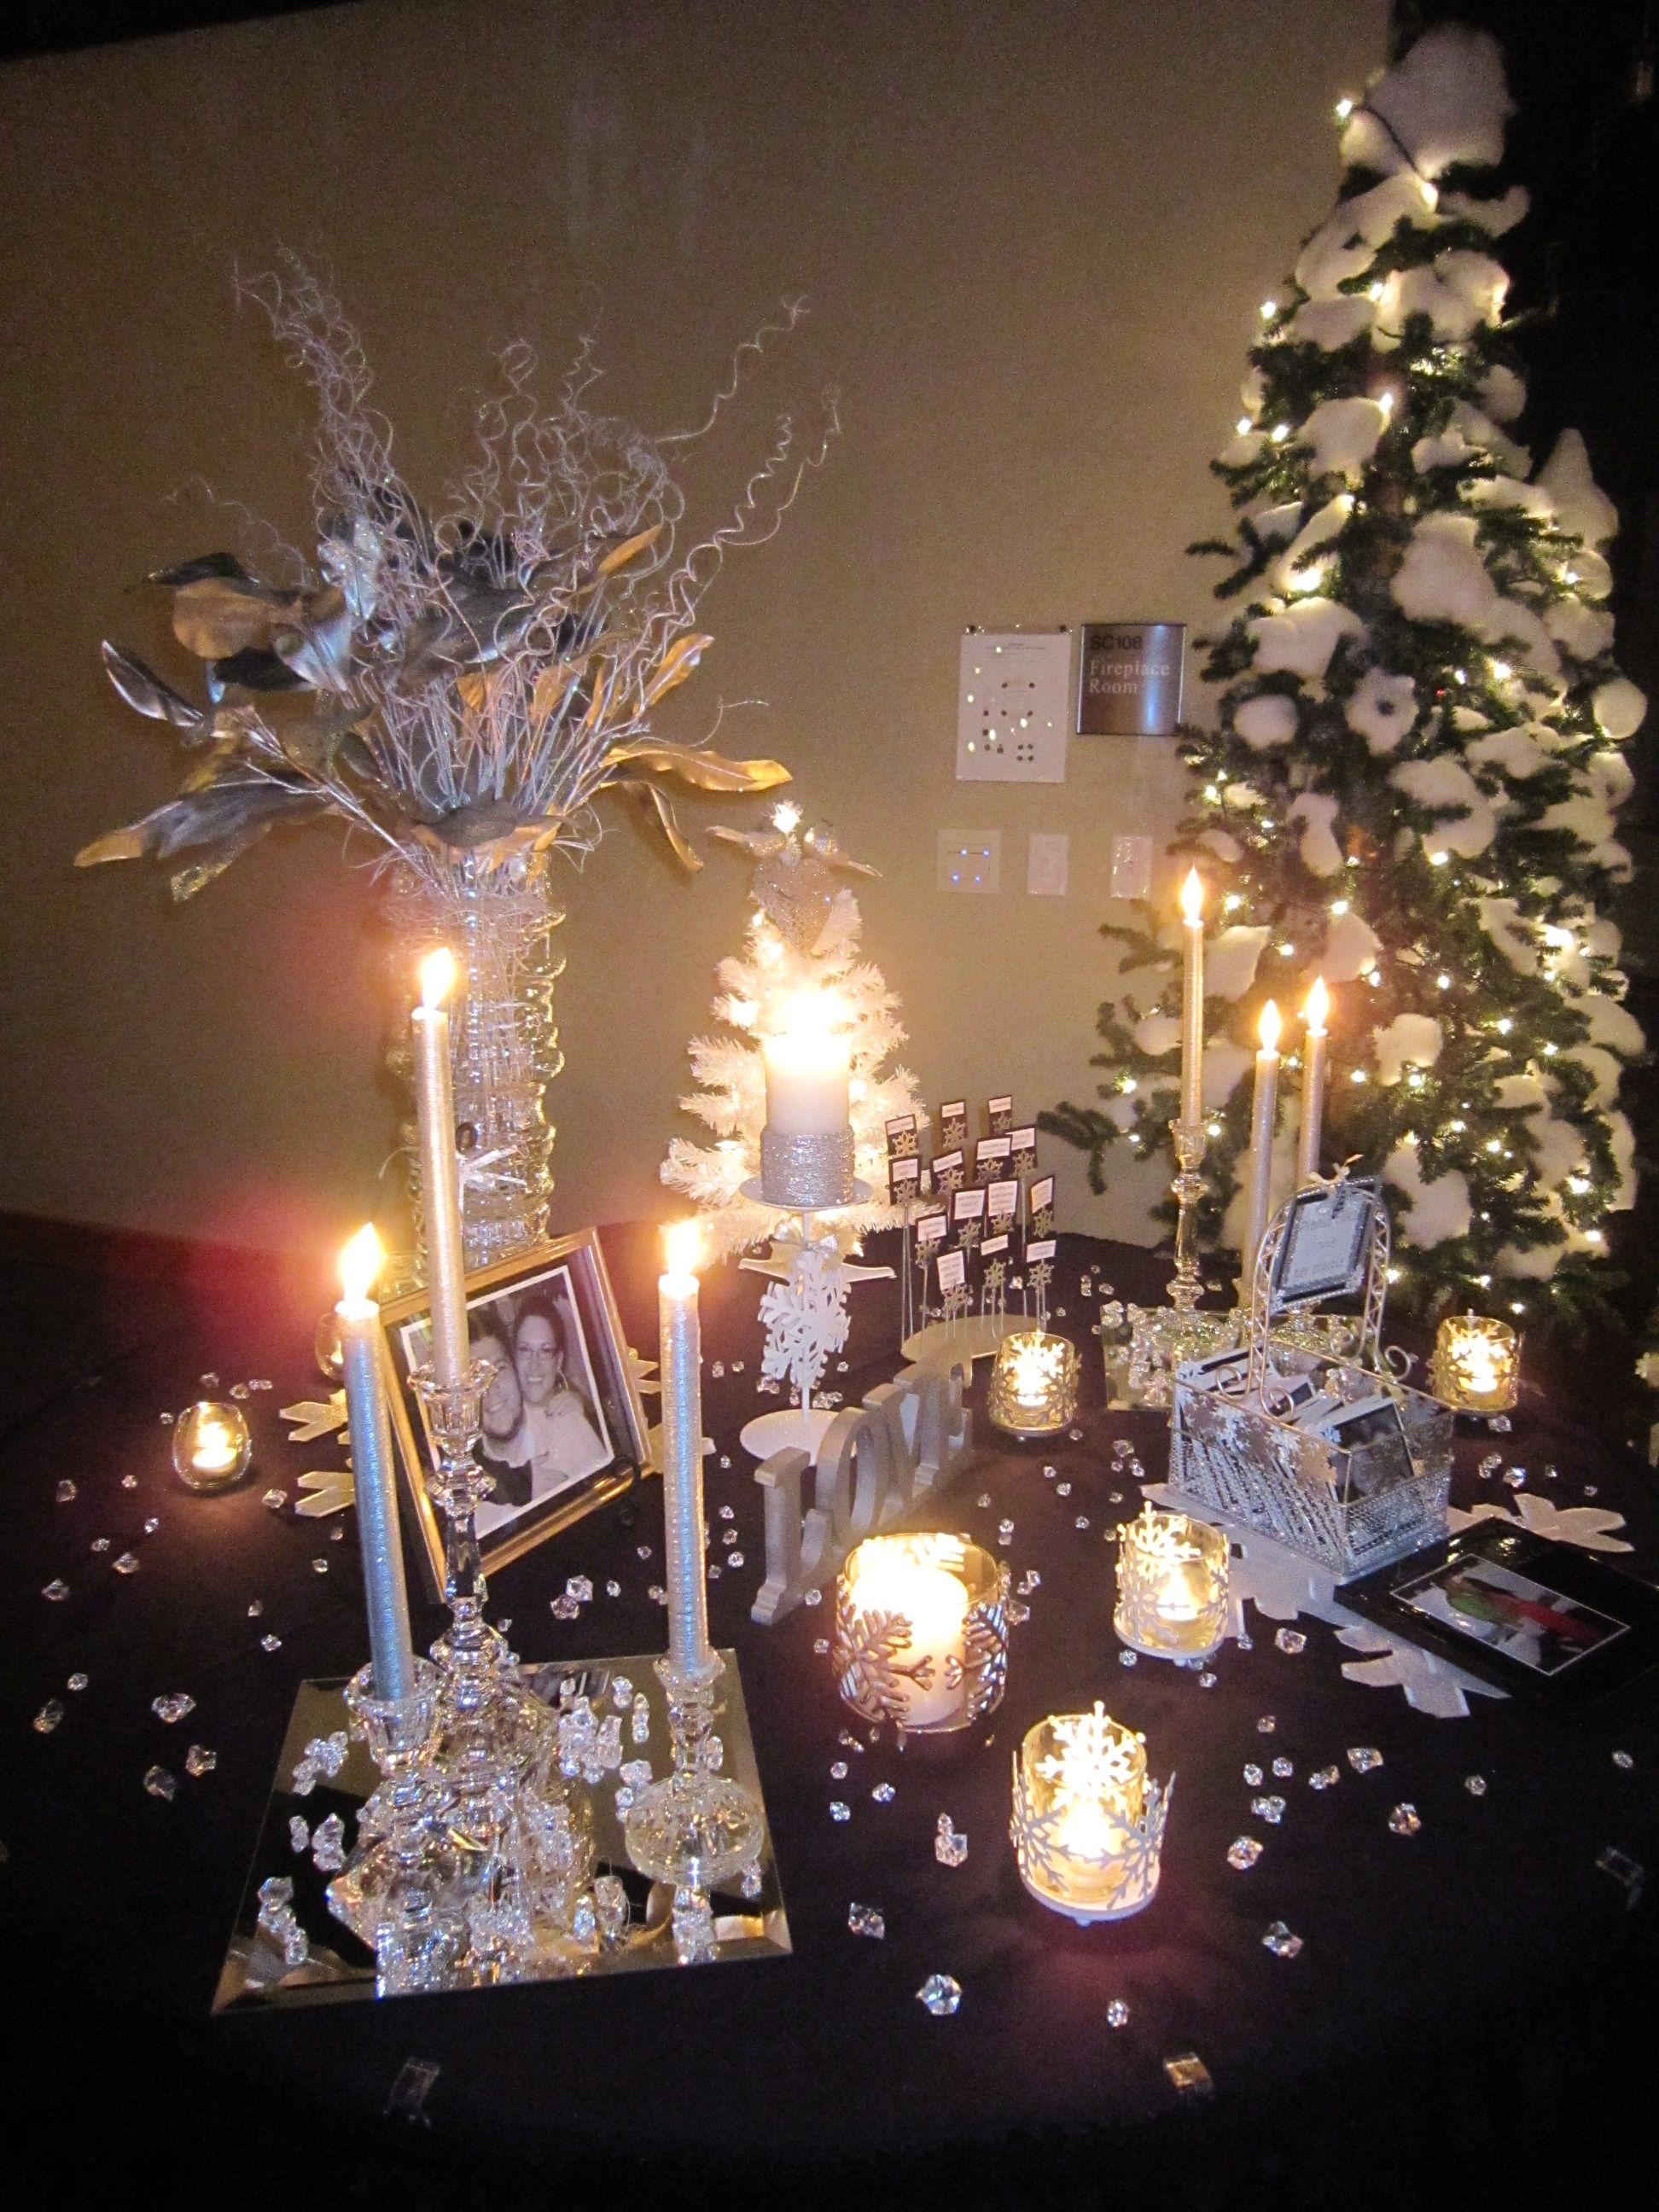 Bride Groom Memory Table At Rehearsal Dinner Memory Table